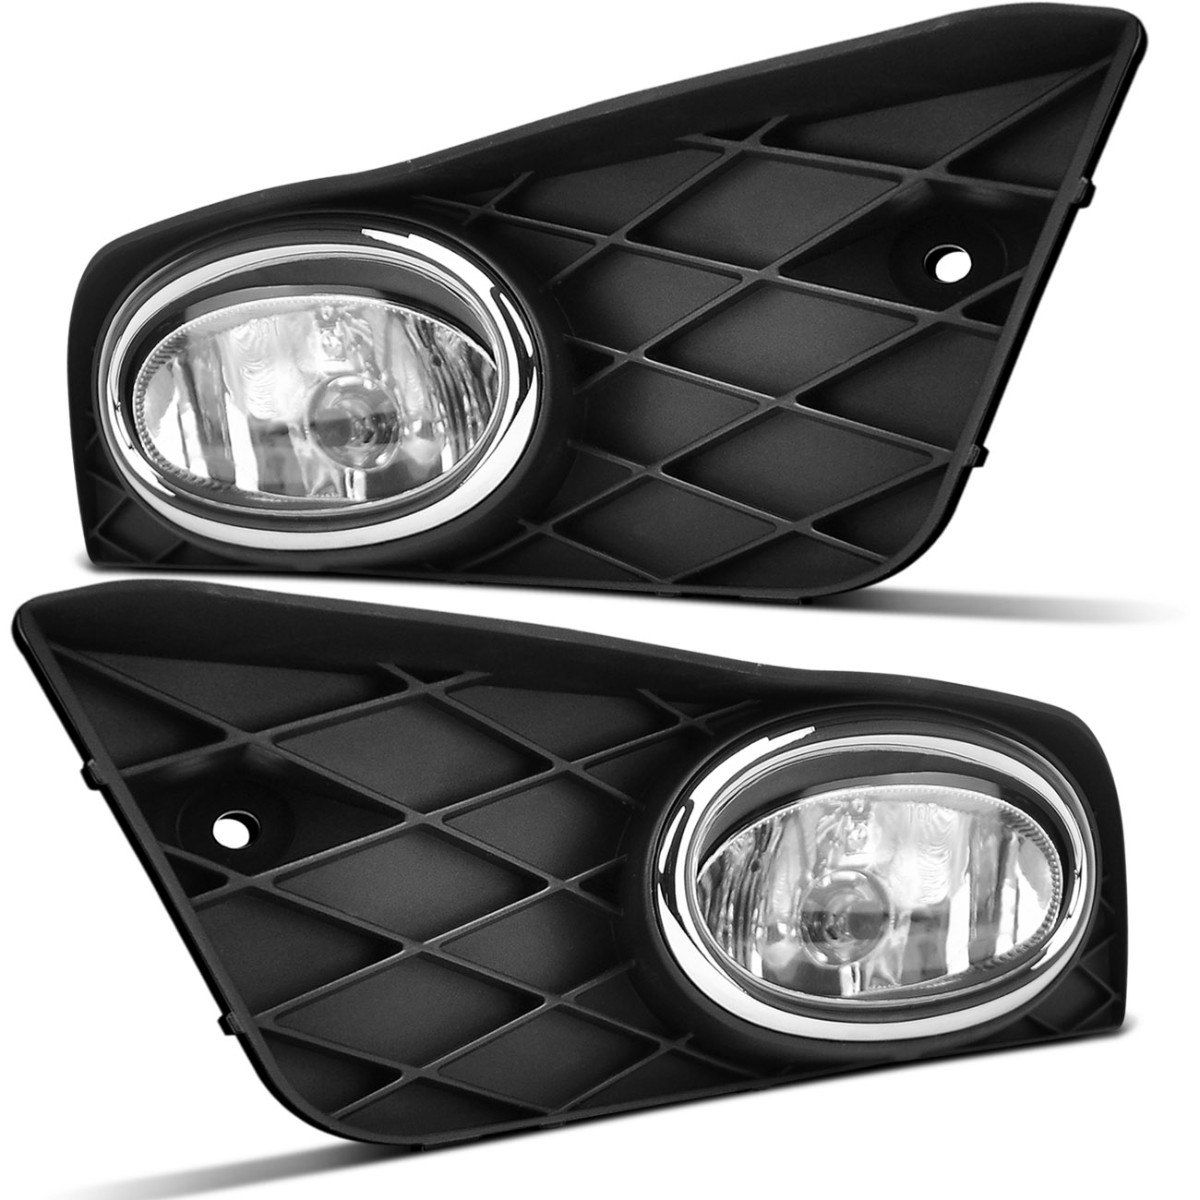 Kit Farol Milha Neblina Honda New Civic 12 13 14 Bt Original